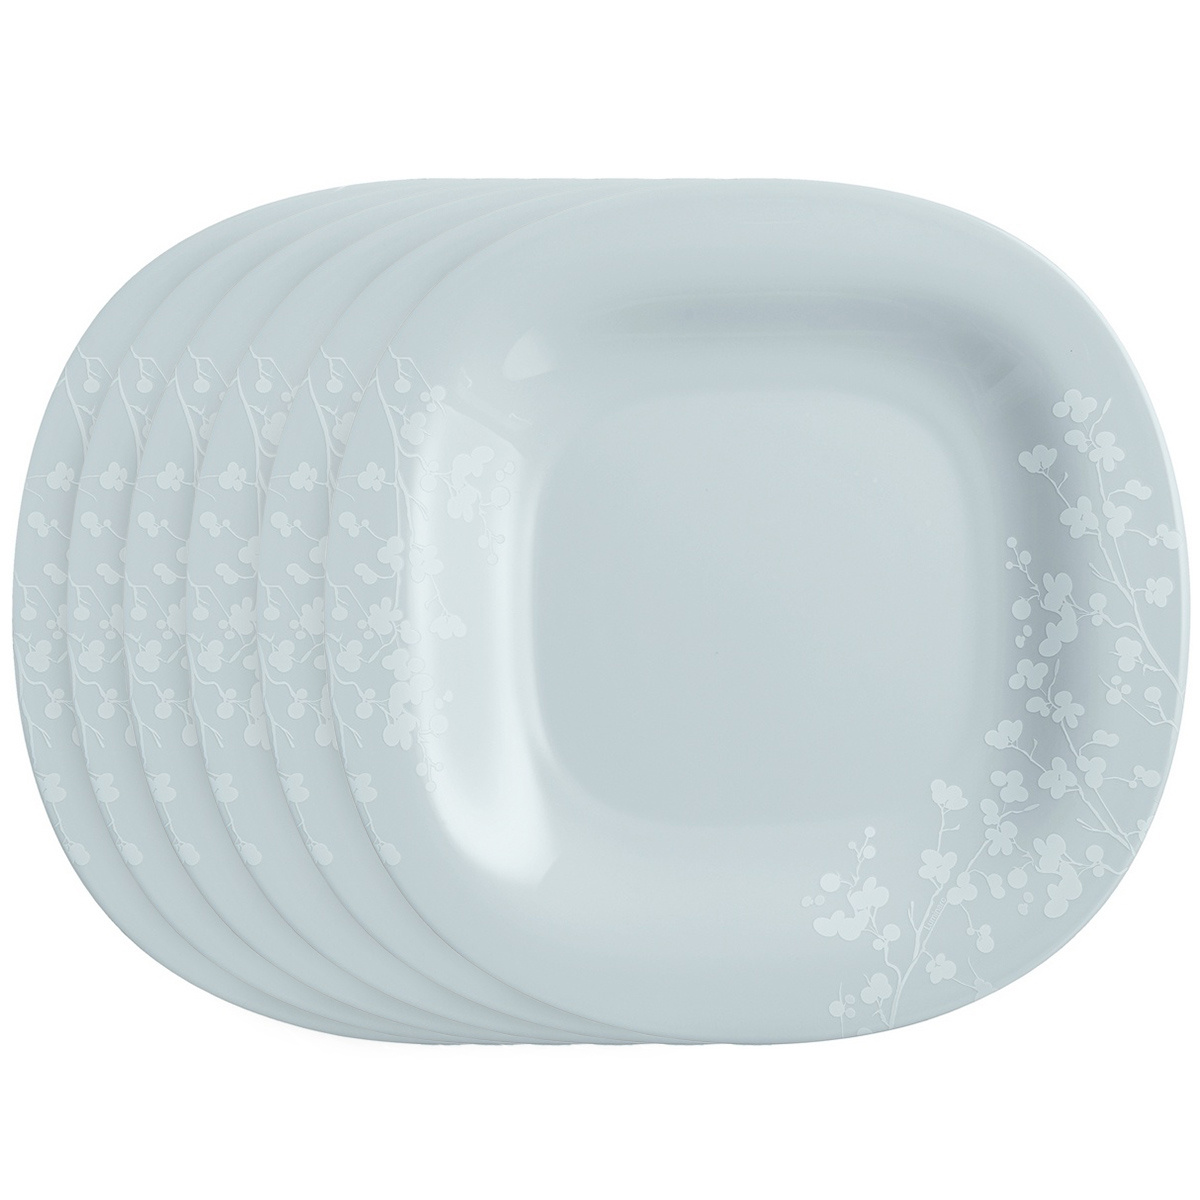 Luminarc Sada dezertných tanierov Ombrelle 19 cm, 6 ks, sivá